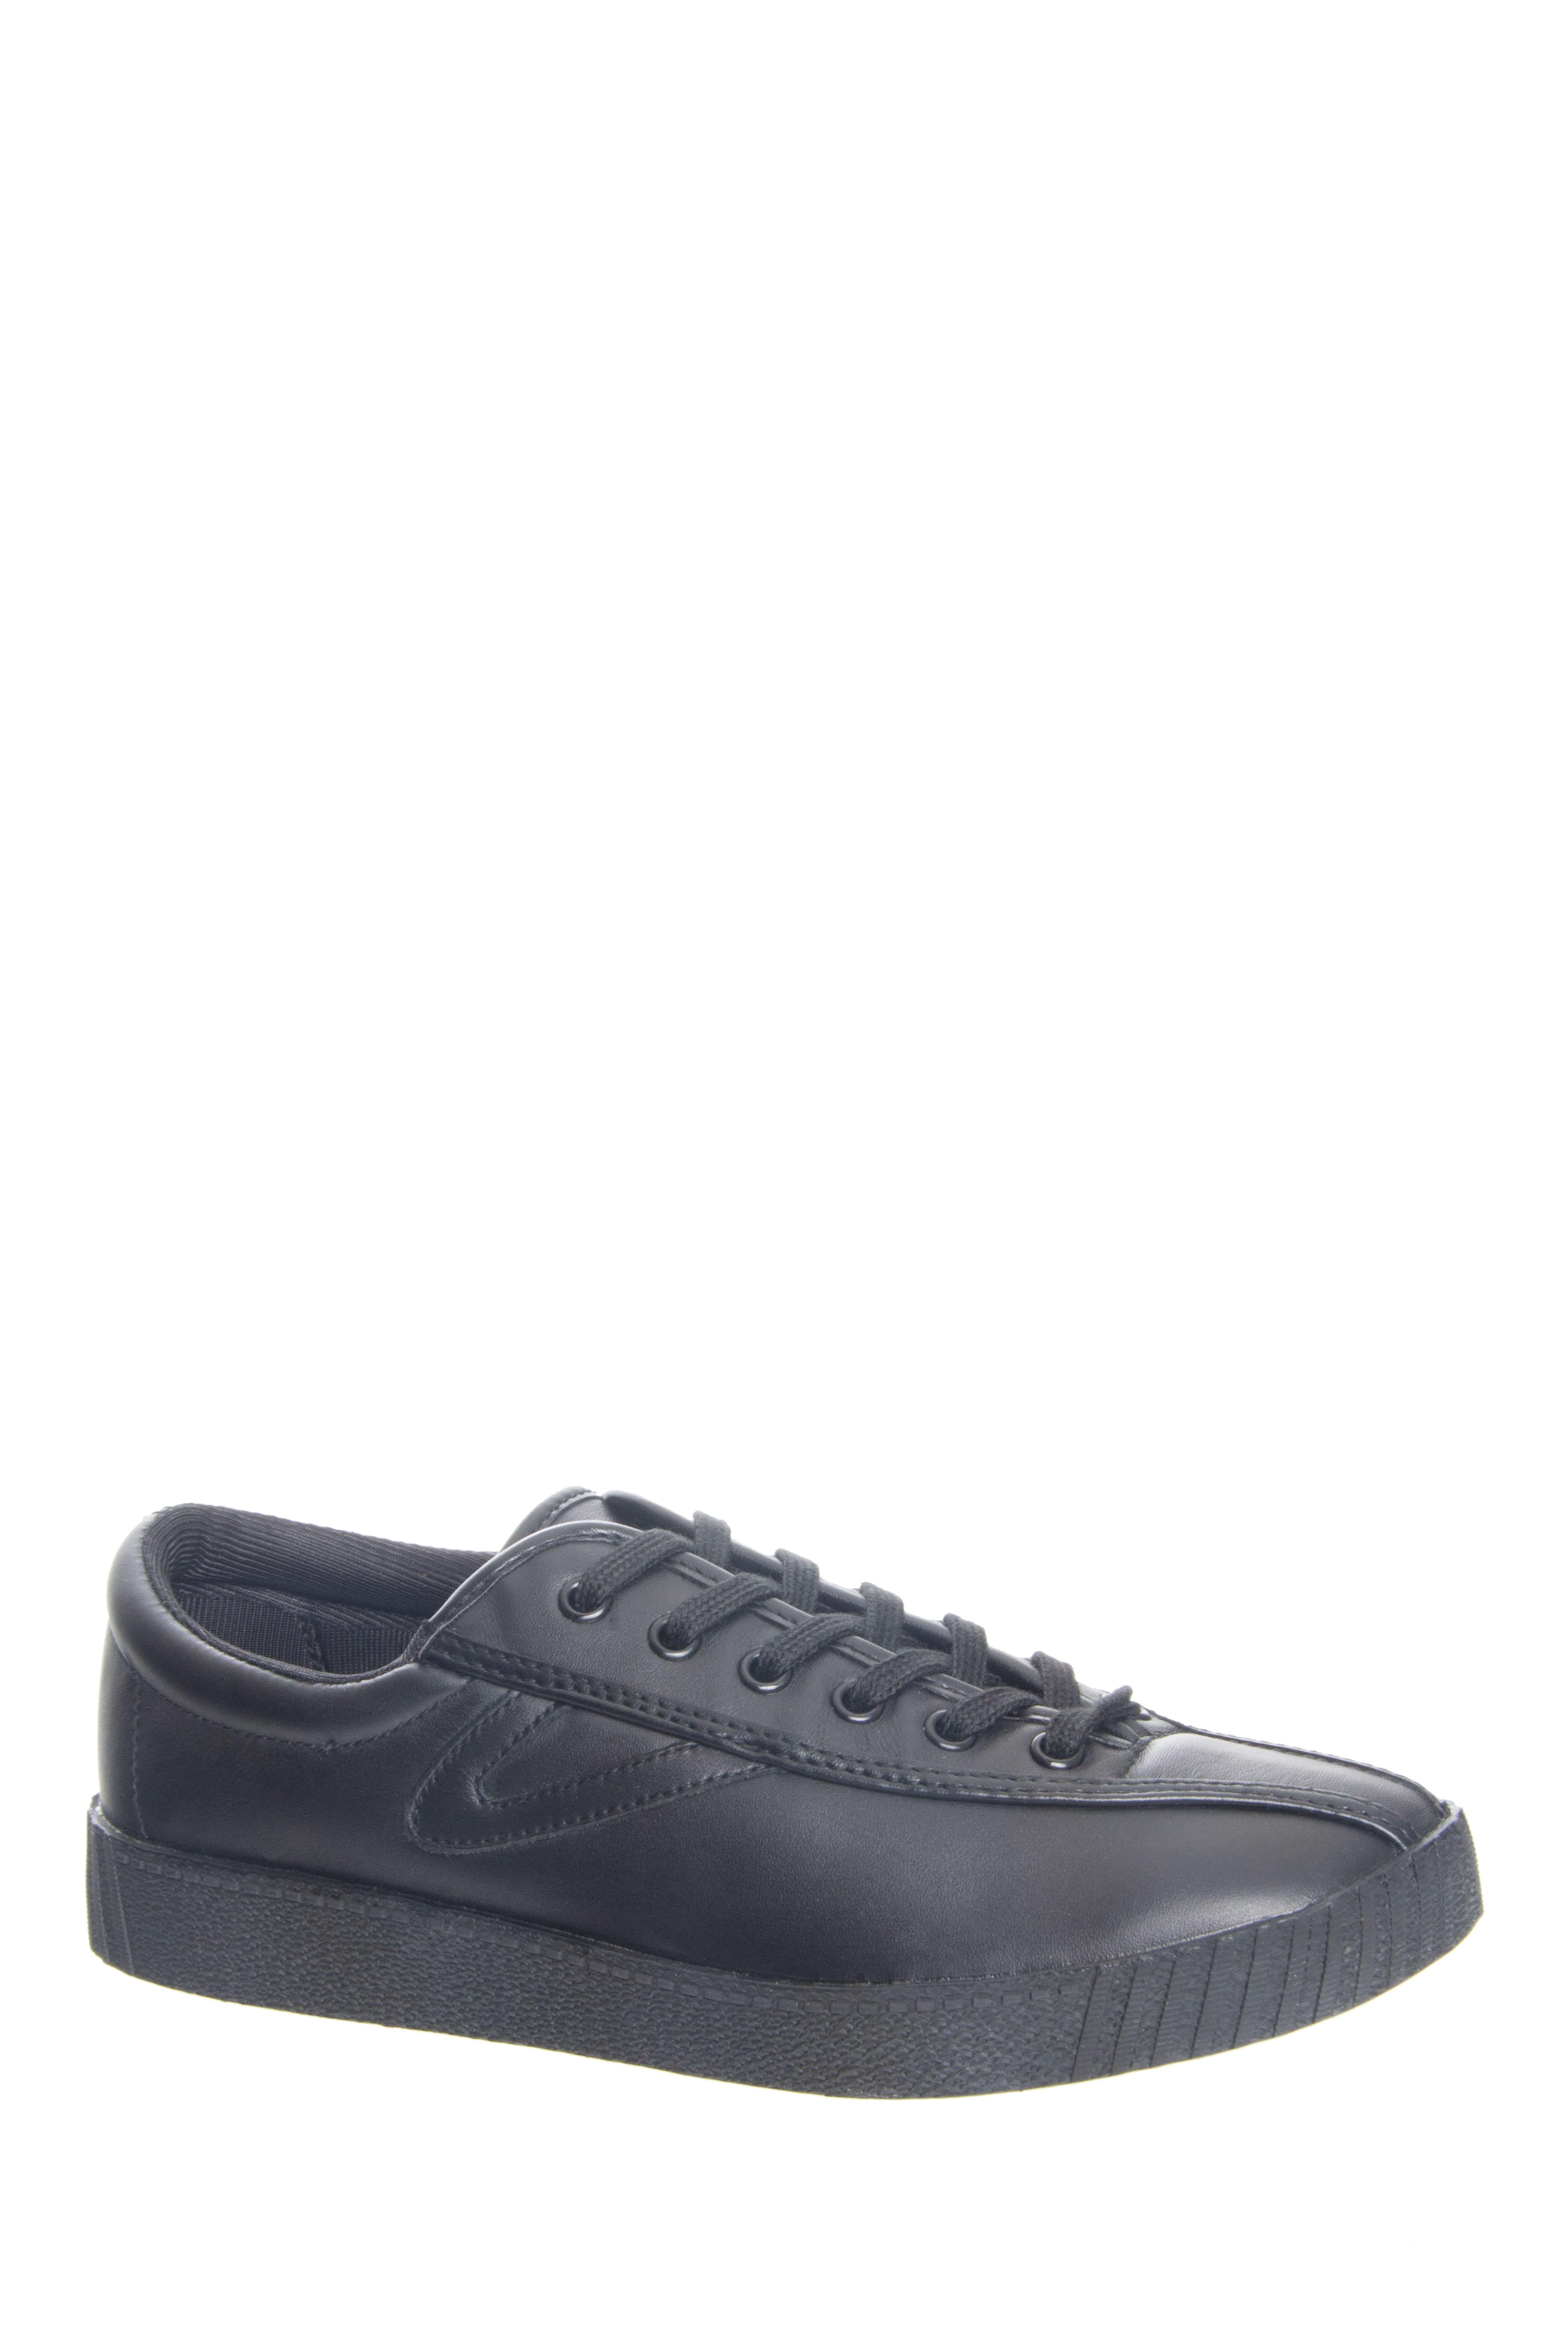 Tretorn Nylite2 Plus Low Top Sneakers - Black